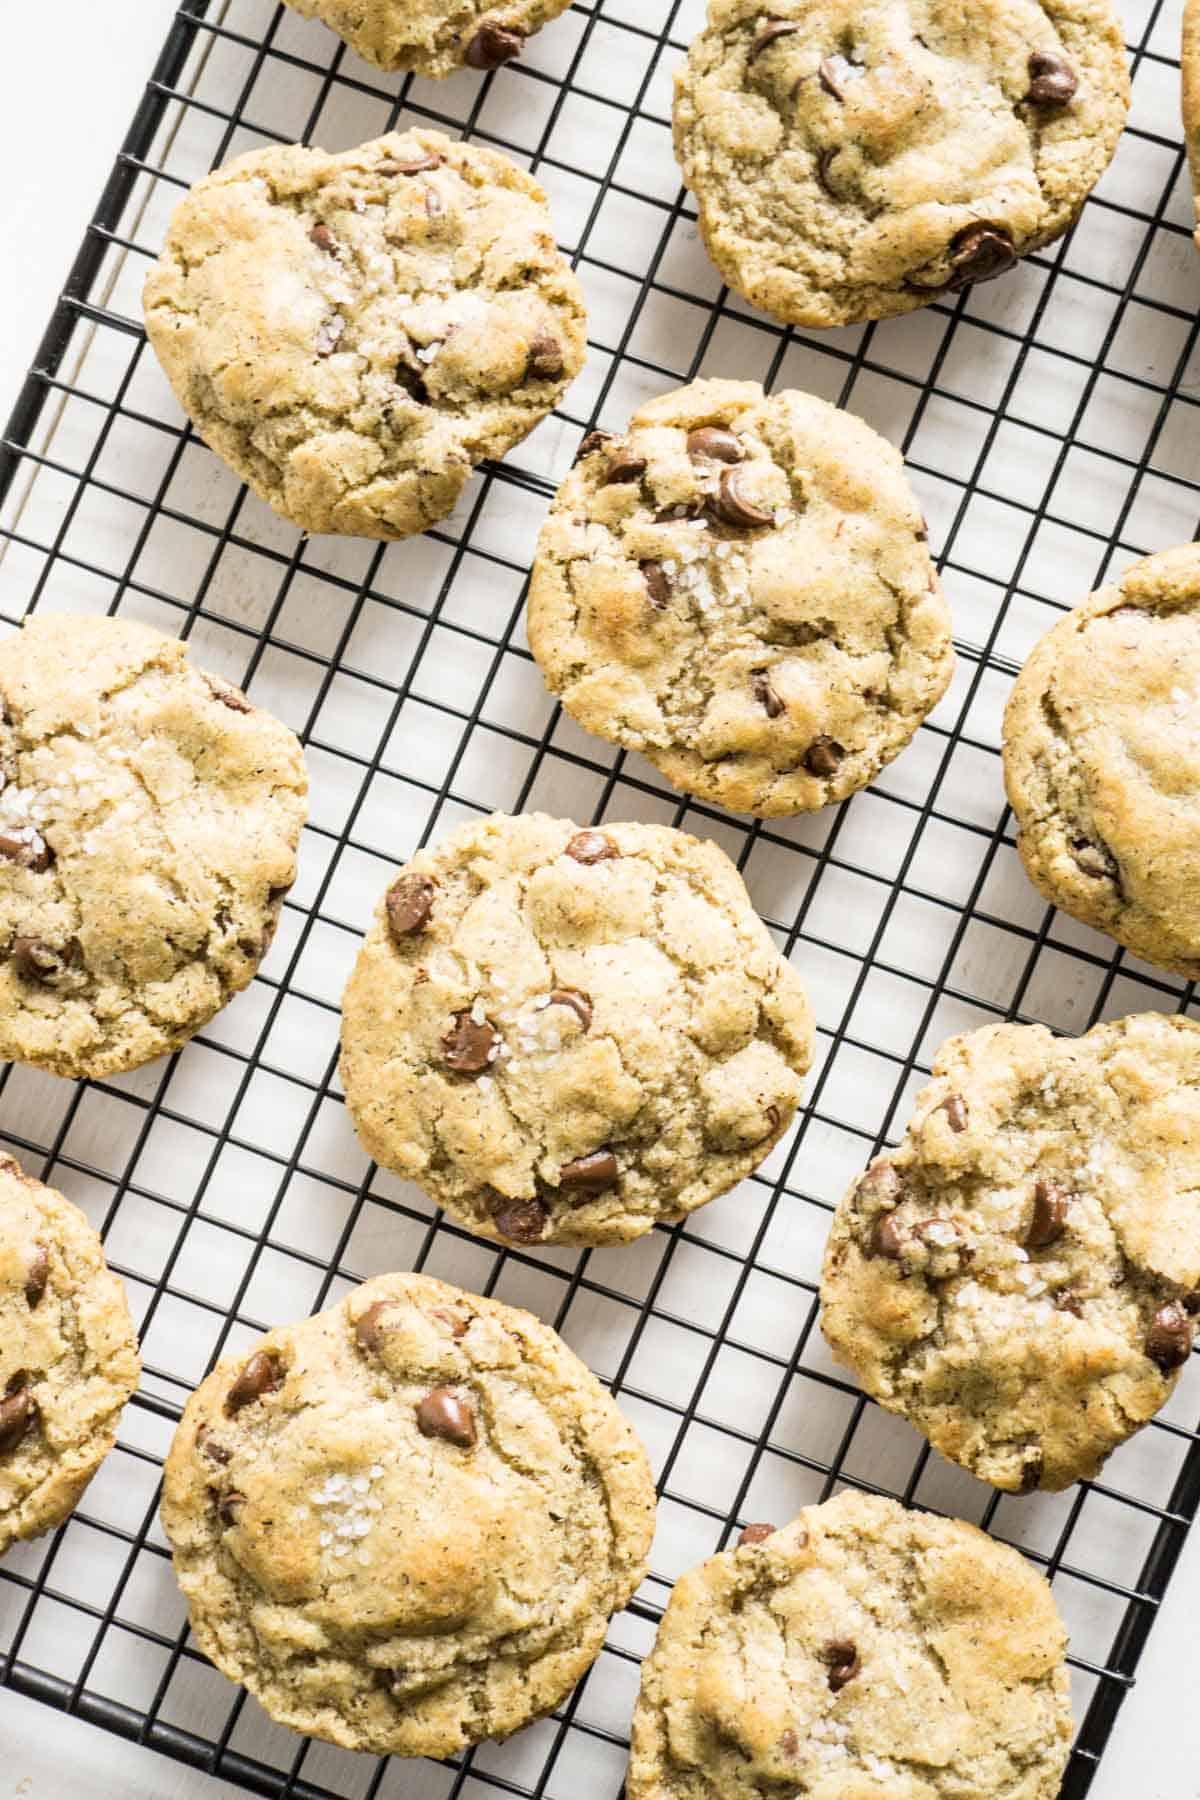 Repurpose Halloween candy to make Chocolate Chip Cookies